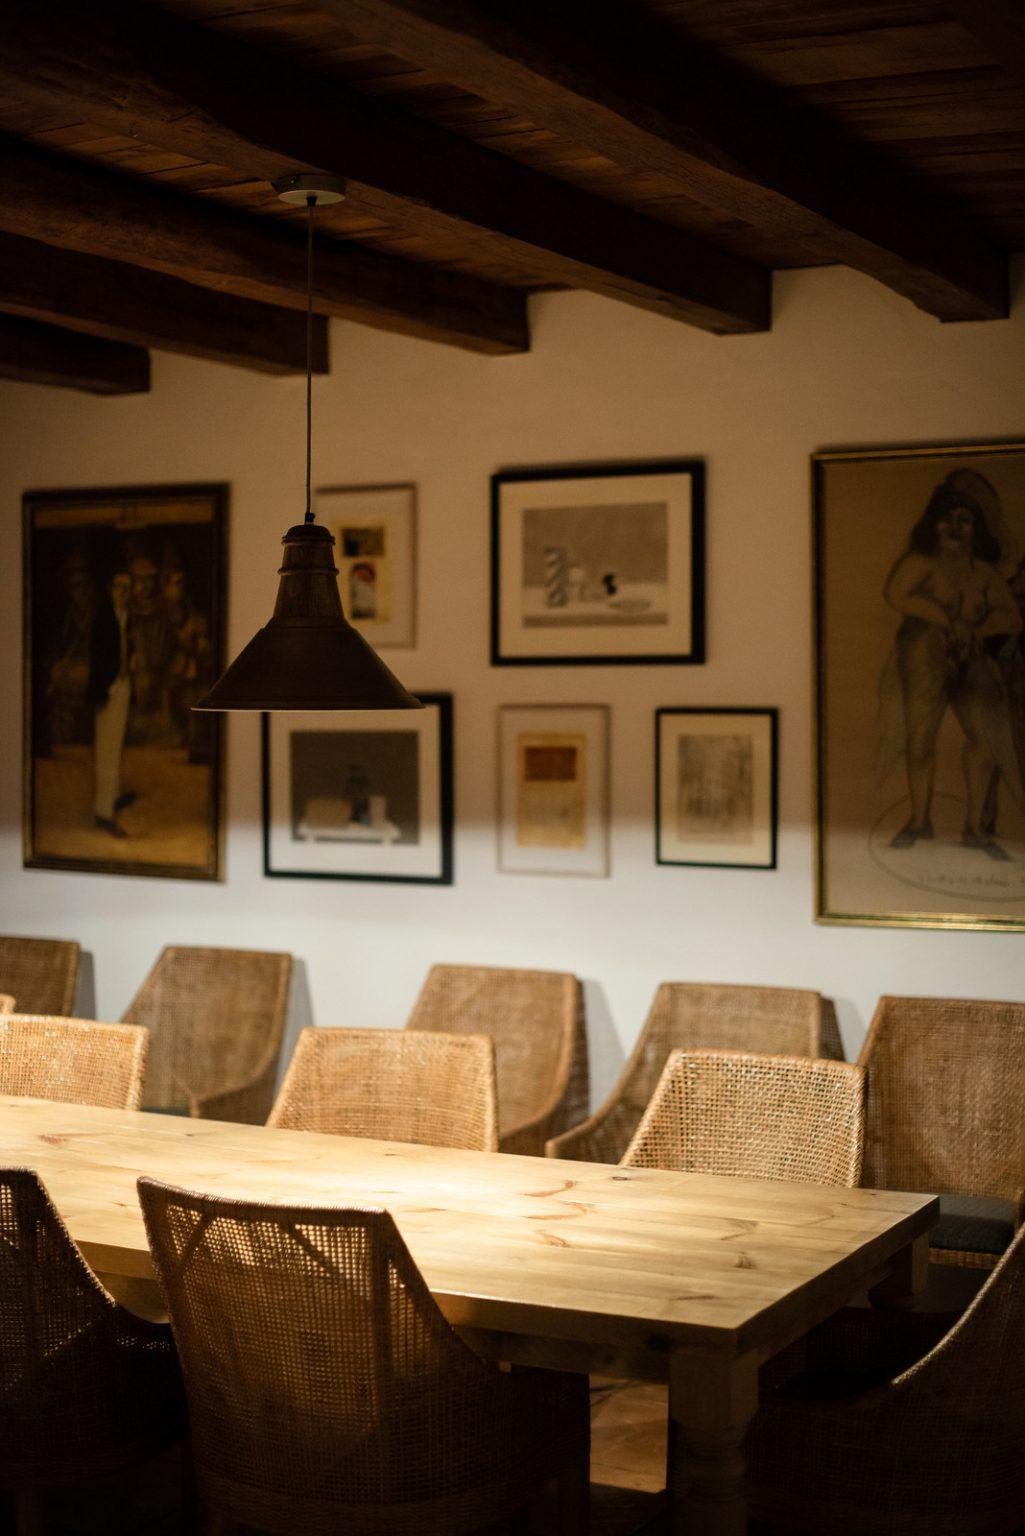 https://www.white-ibiza.com/wp-content/uploads/2020/11/cas-gasi-restaurant-2020-13-1025x1536.jpg